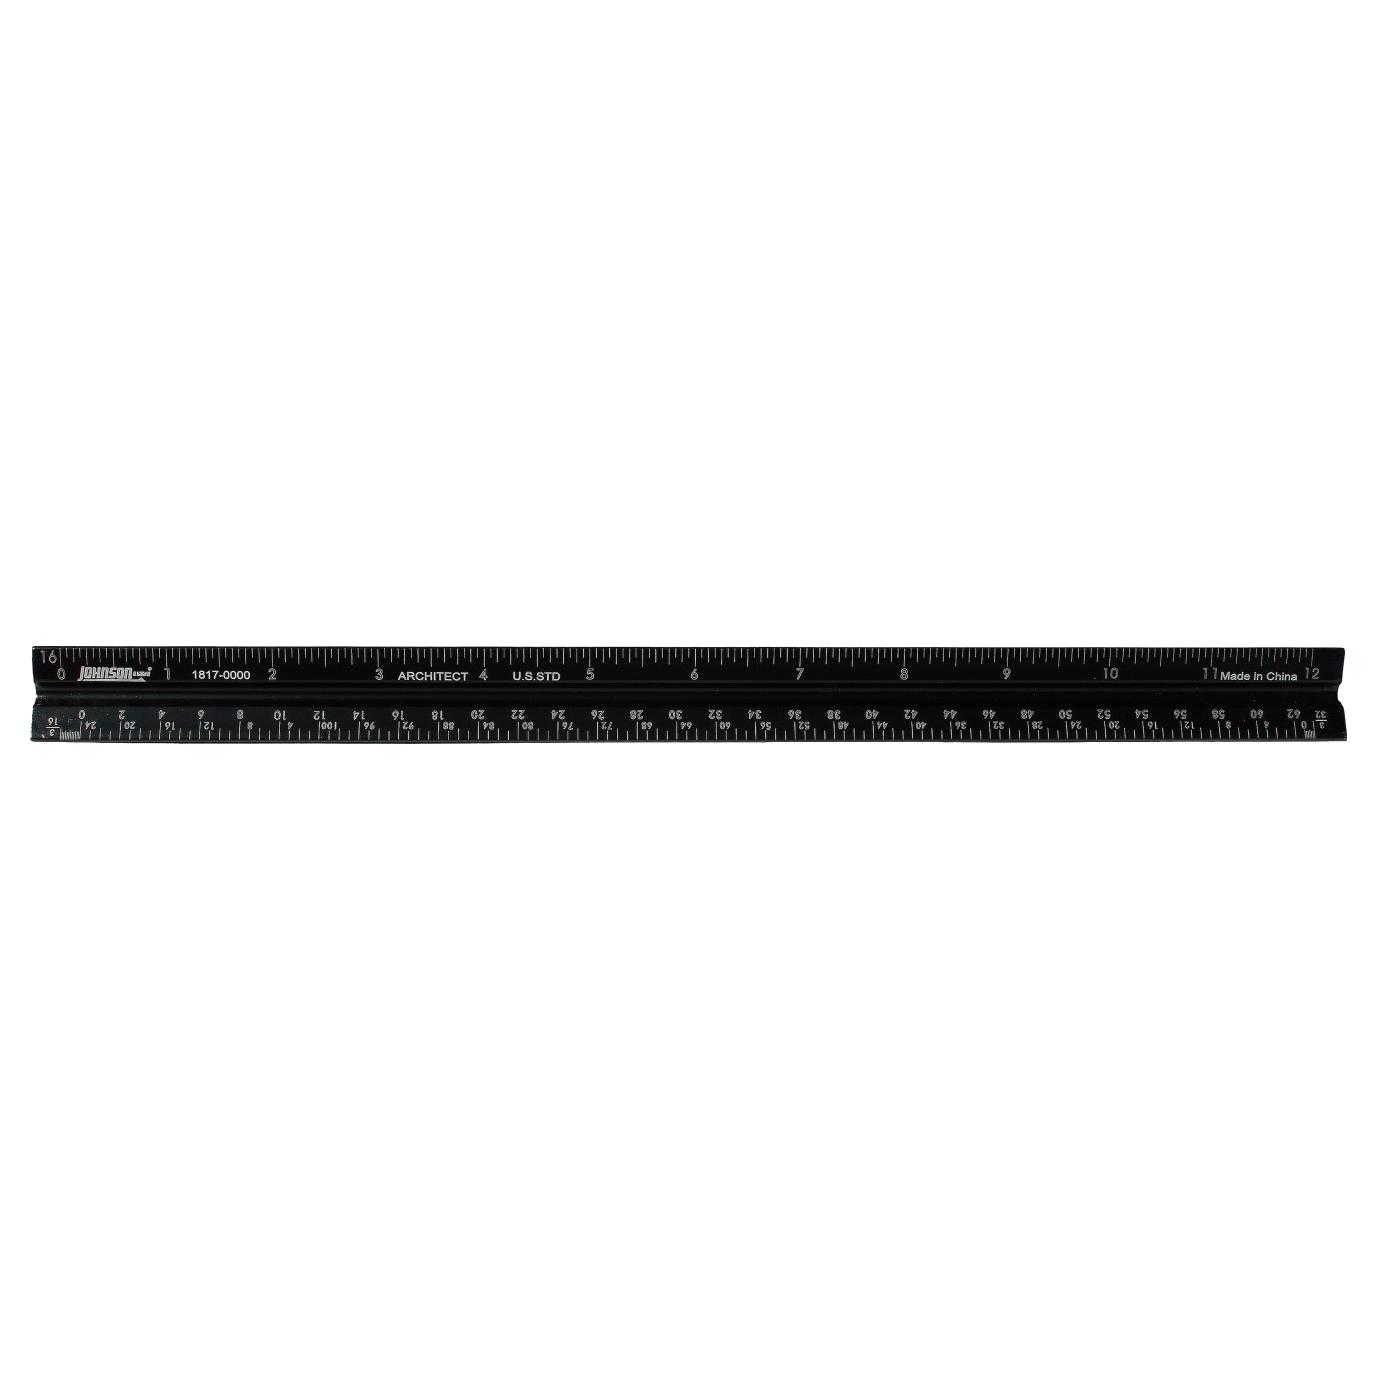 Aluminum Inch/Metric Meterstick   Johnson Level  for Full Meter Stick  83fiz